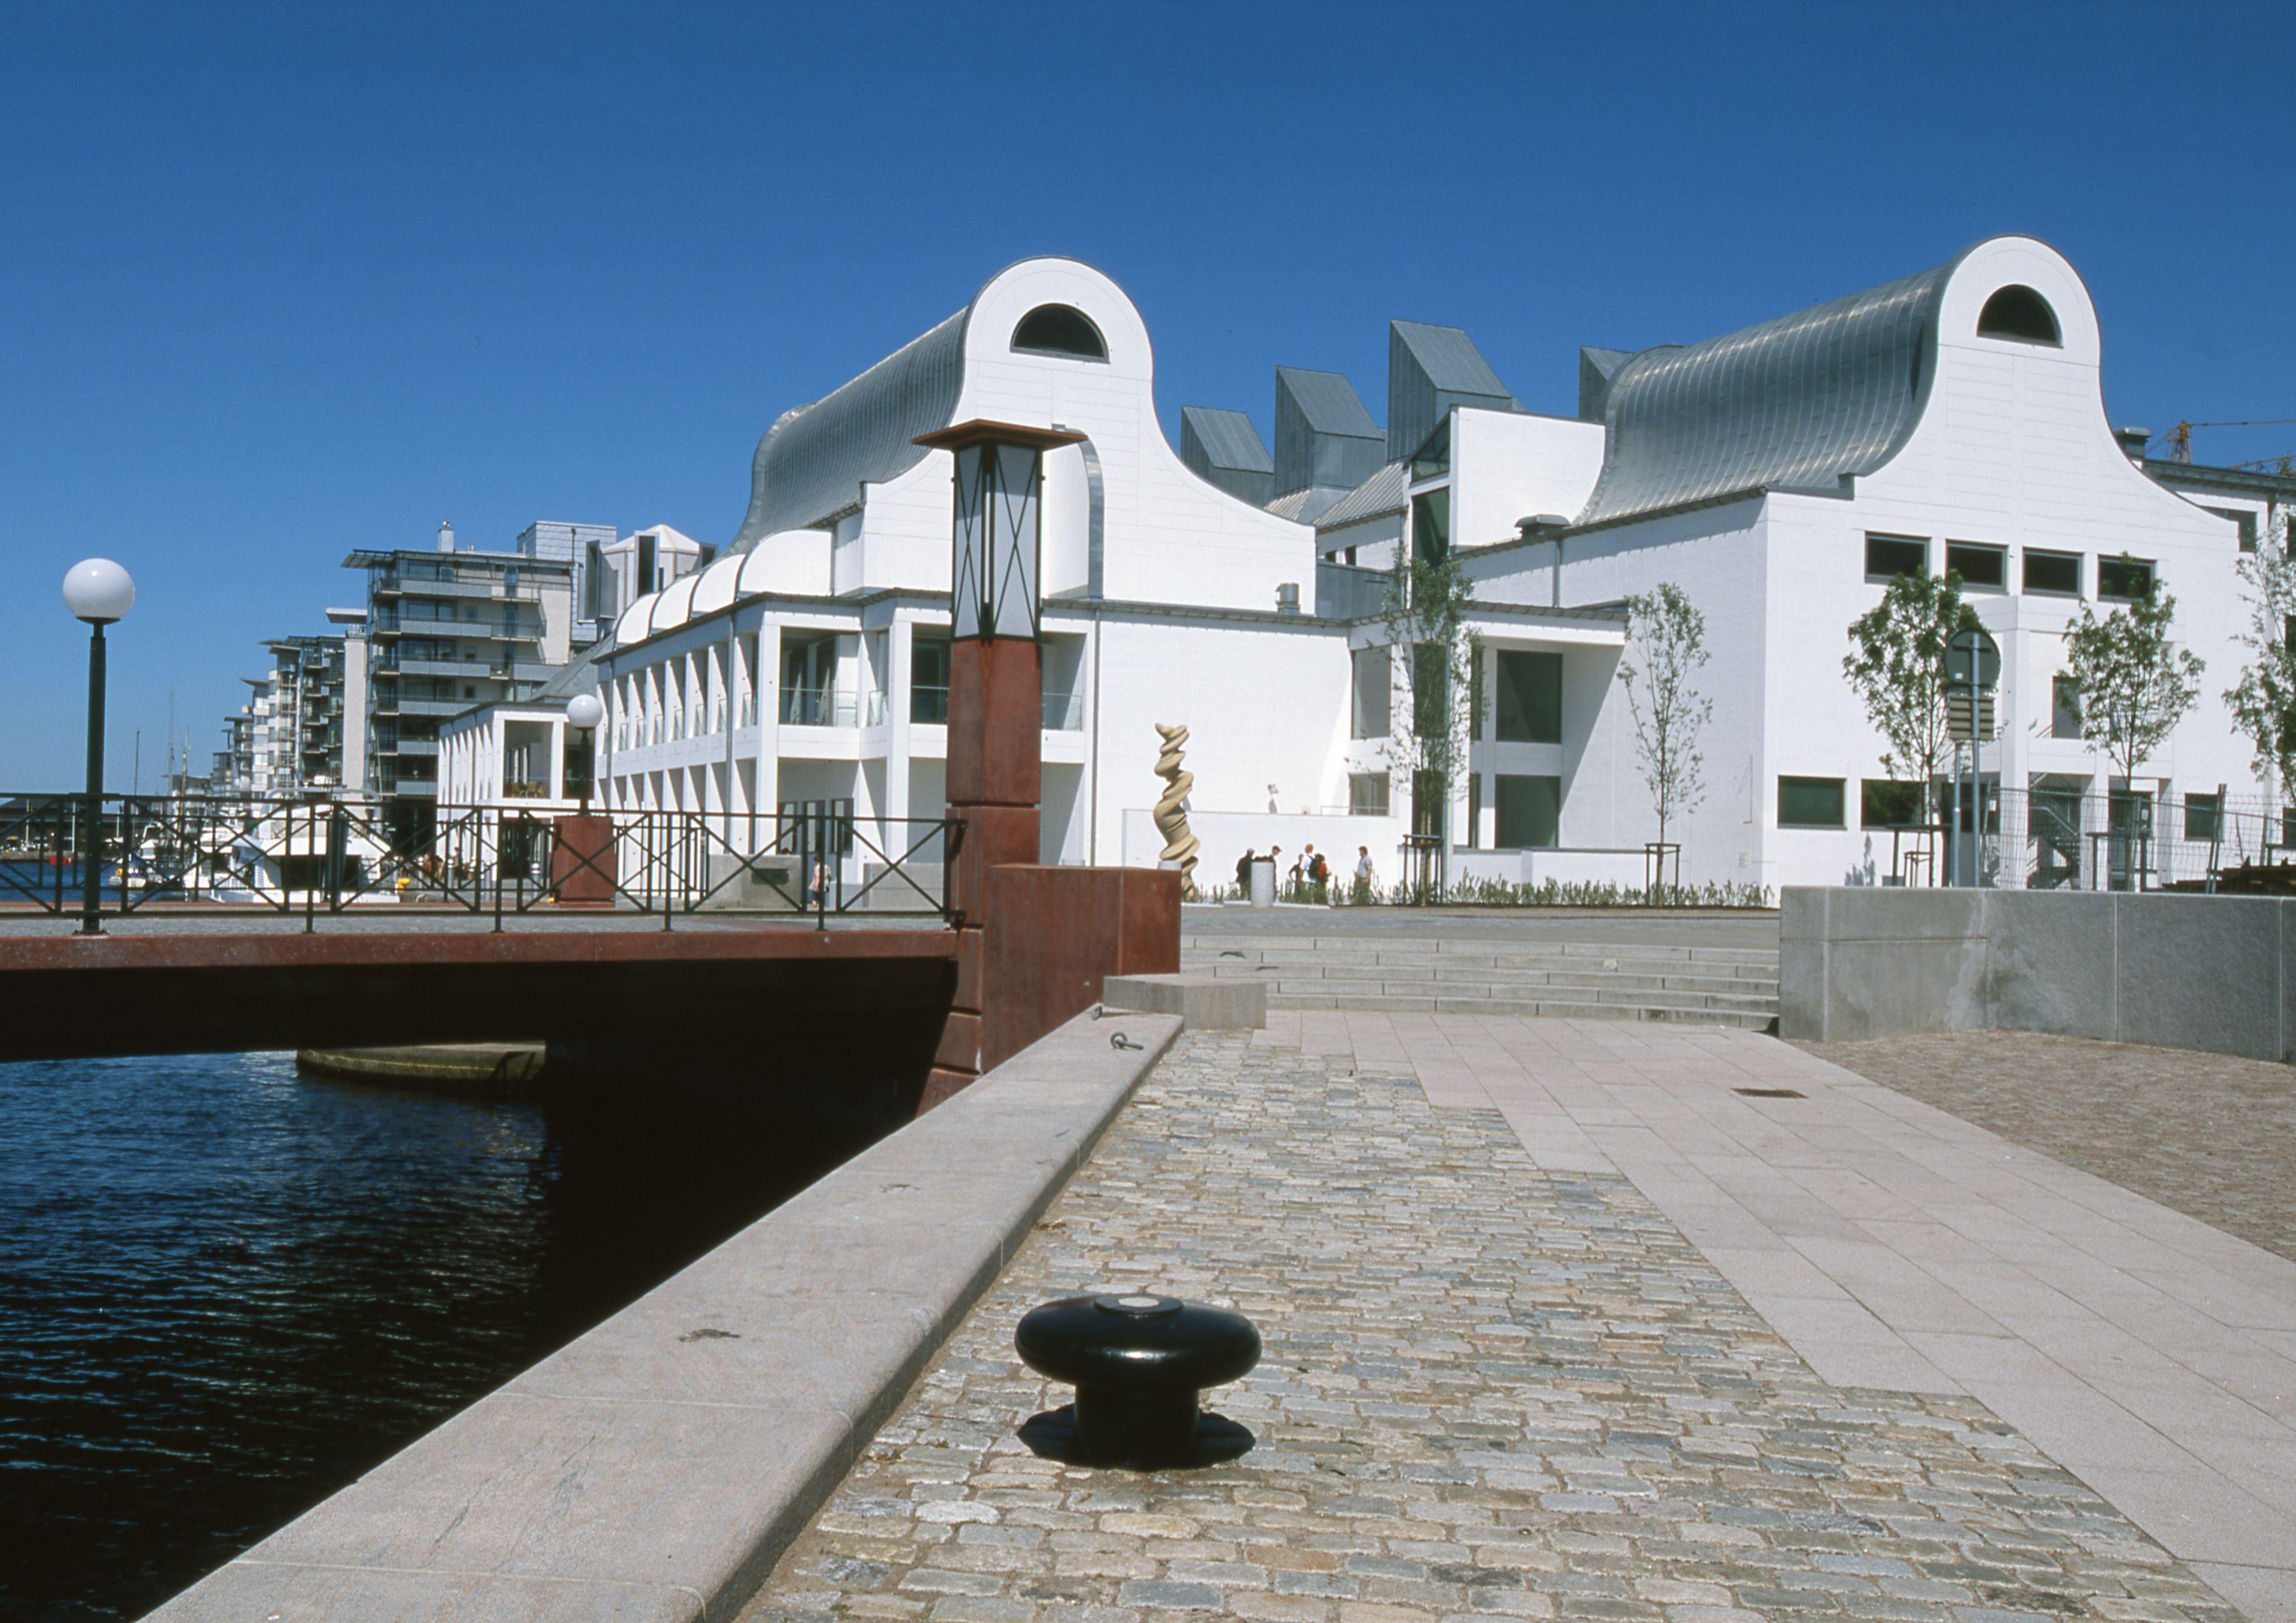 Birger Lallo, Dunkers Cultural Center - Dunkers Kulturhus